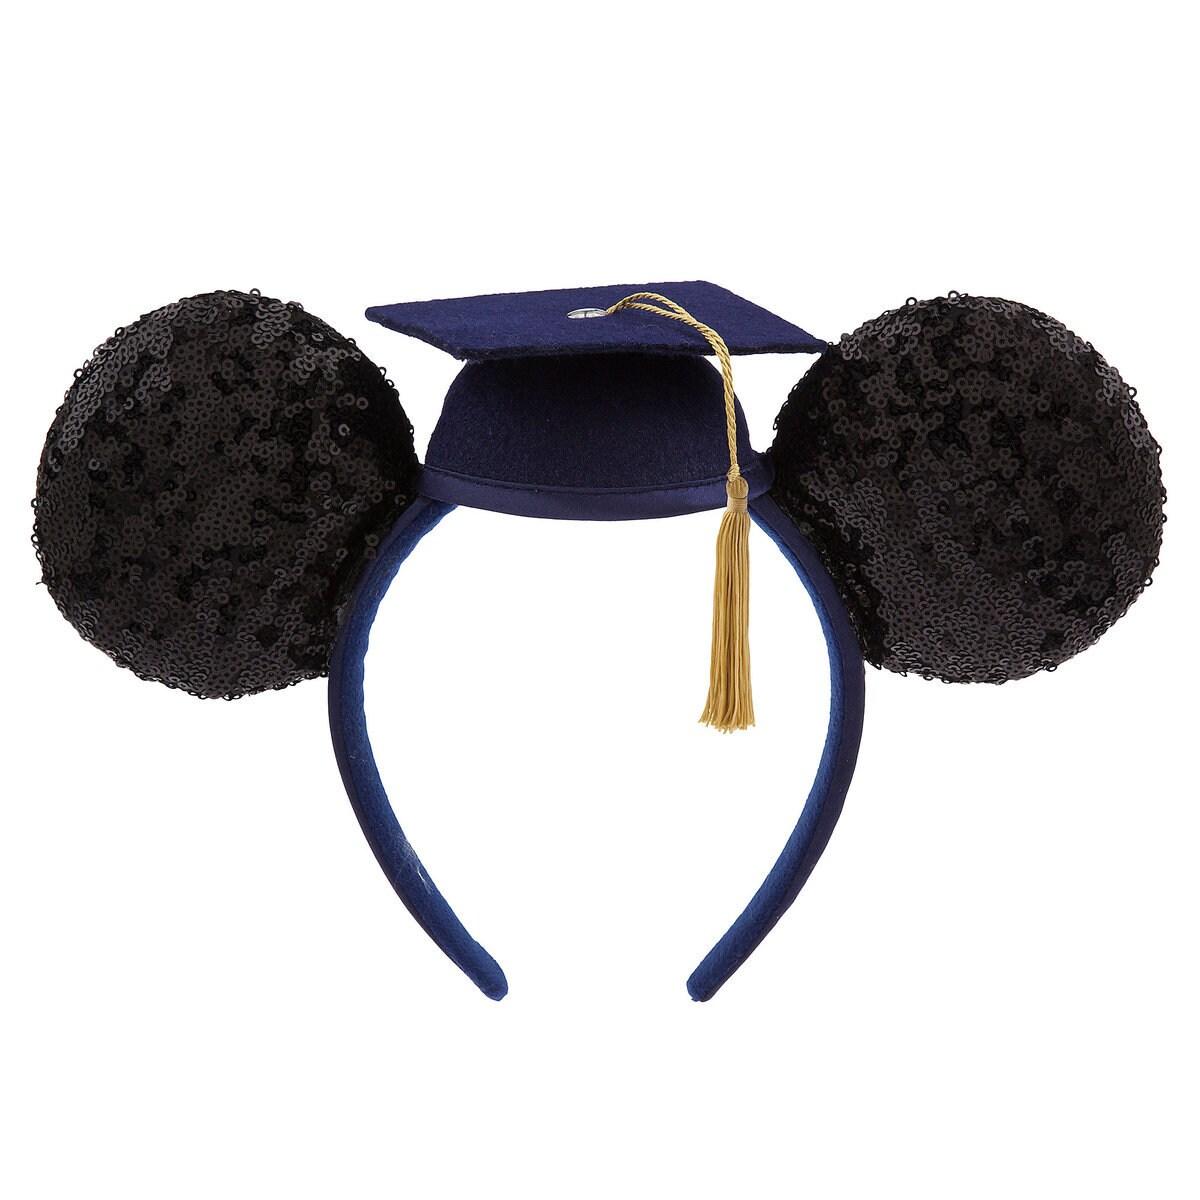 sale retailer 31777 62b6e Product Image of Mickey Mouse Graduation Cap Ear Headband - Class of 2019    1